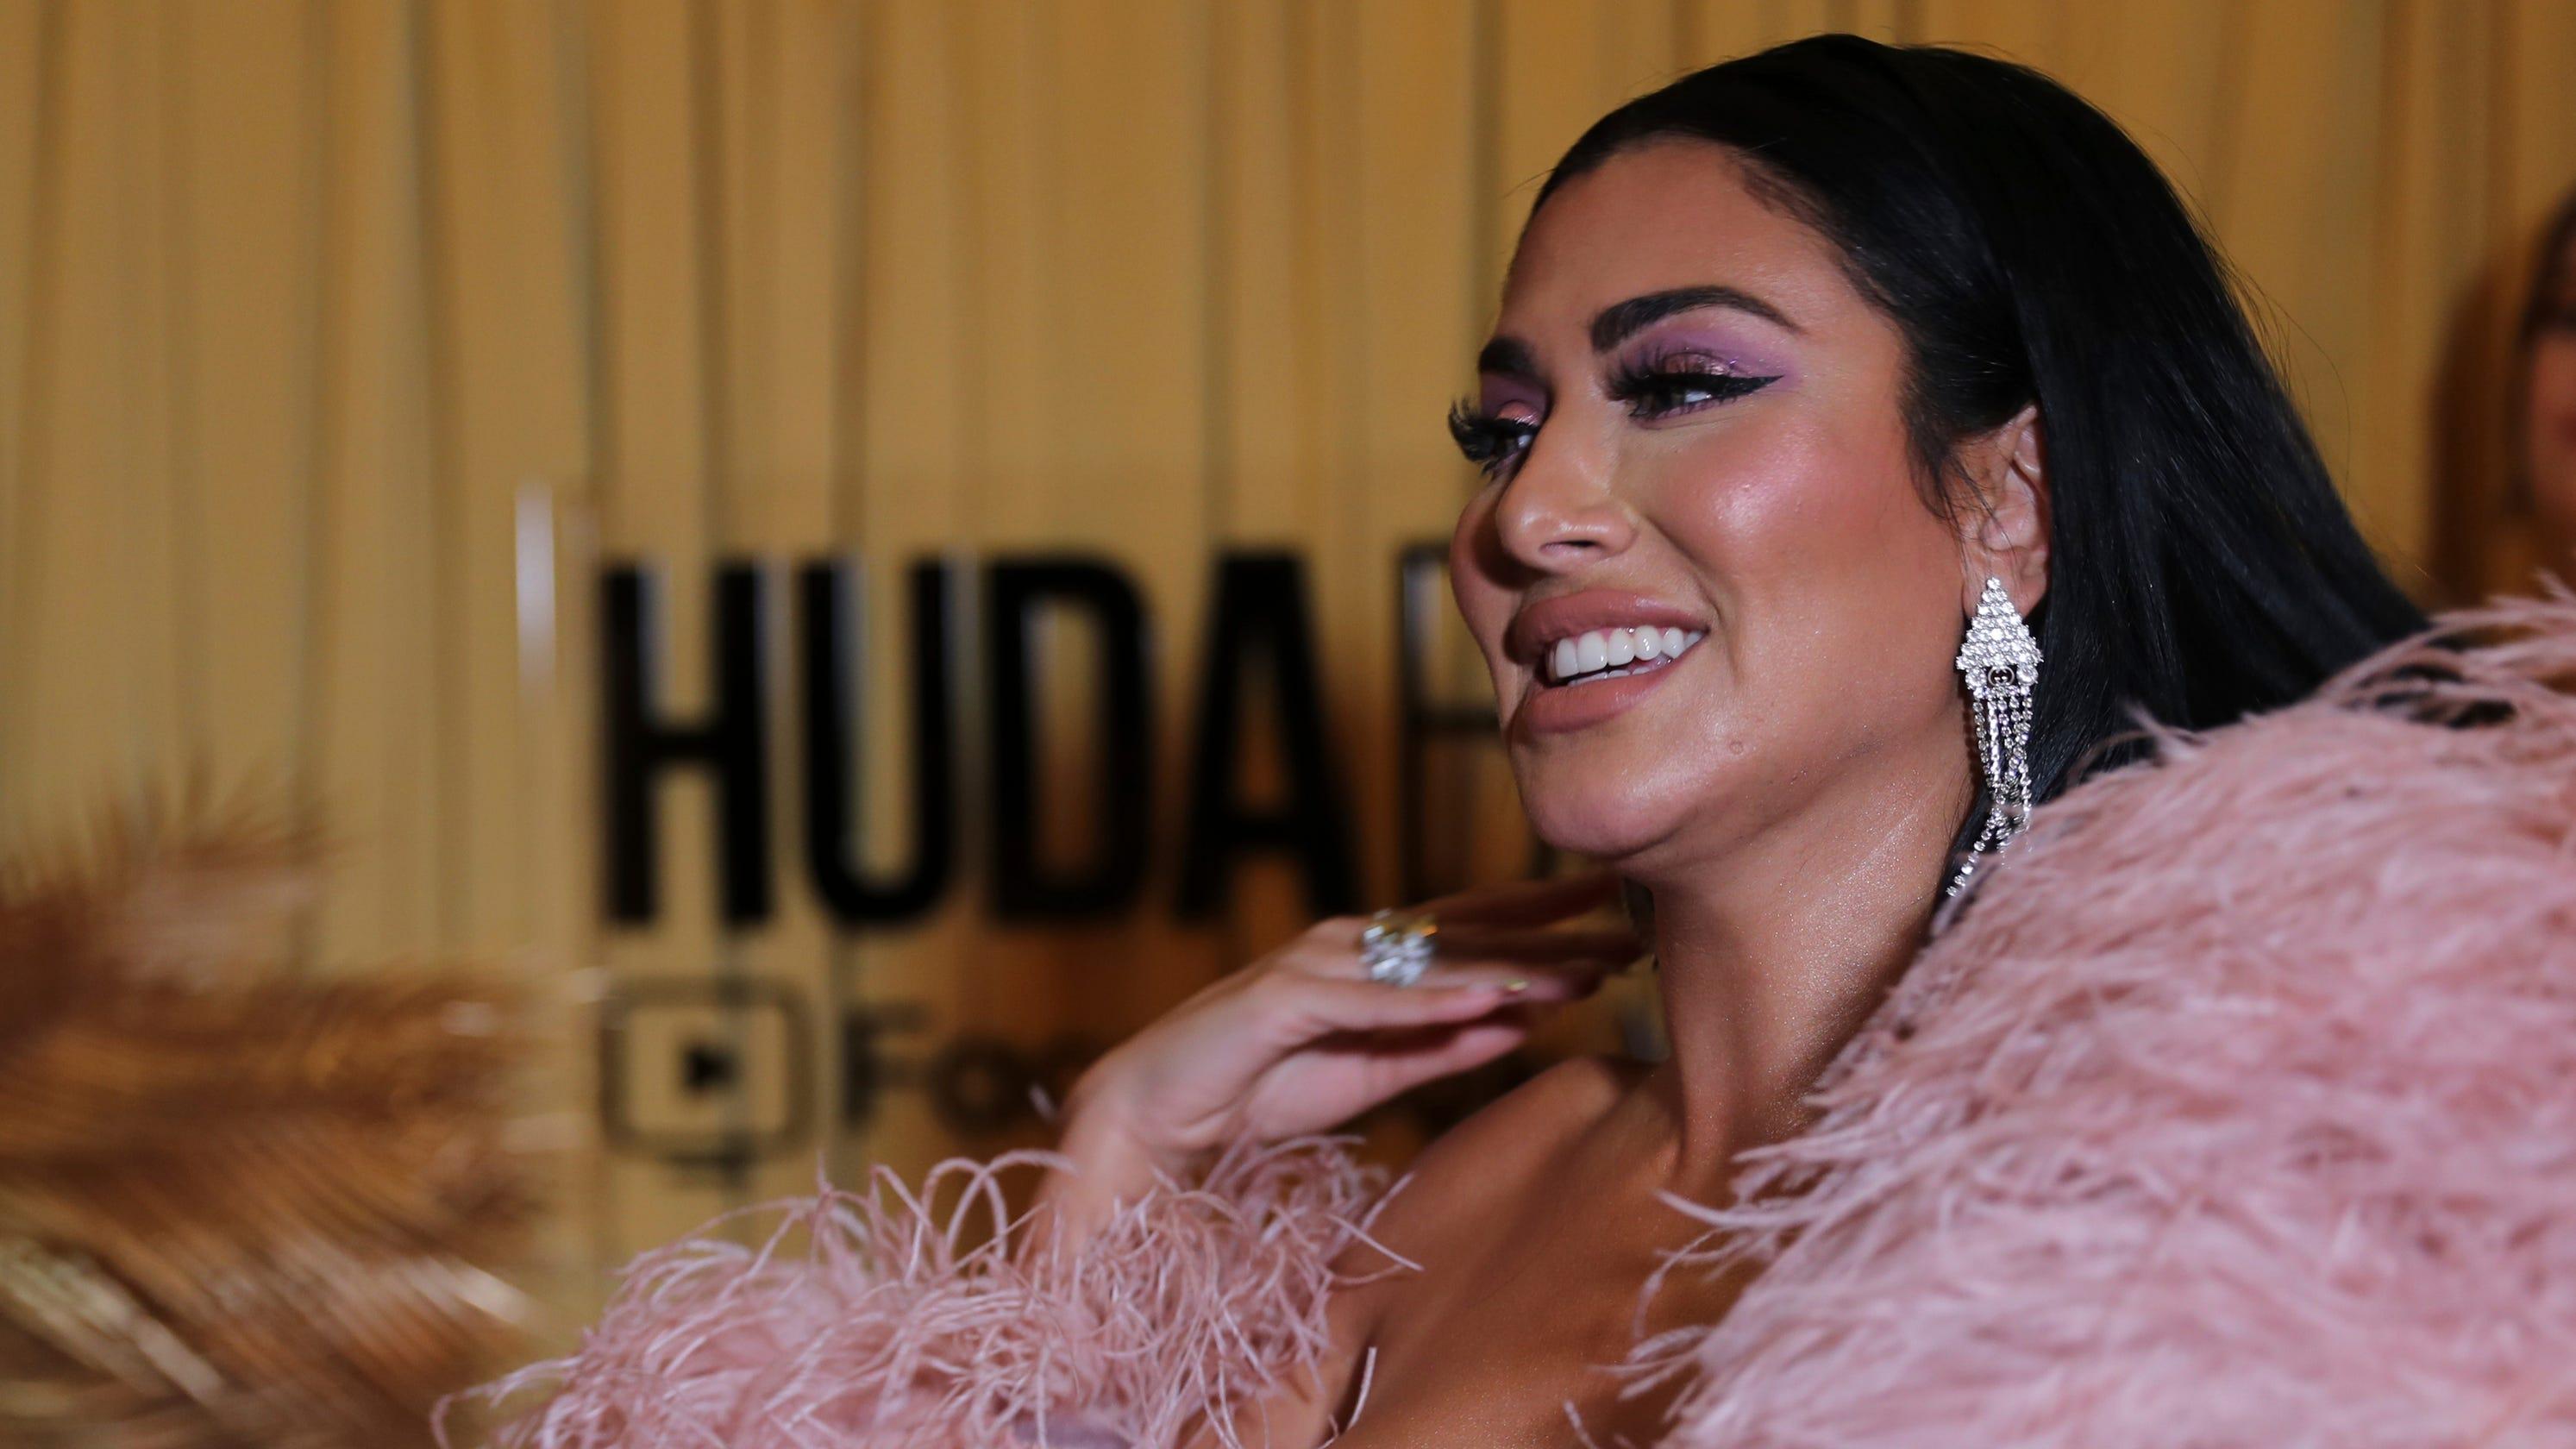 For Huda Kattan, beauty has become a $1.2 billion empire - USA TODAY